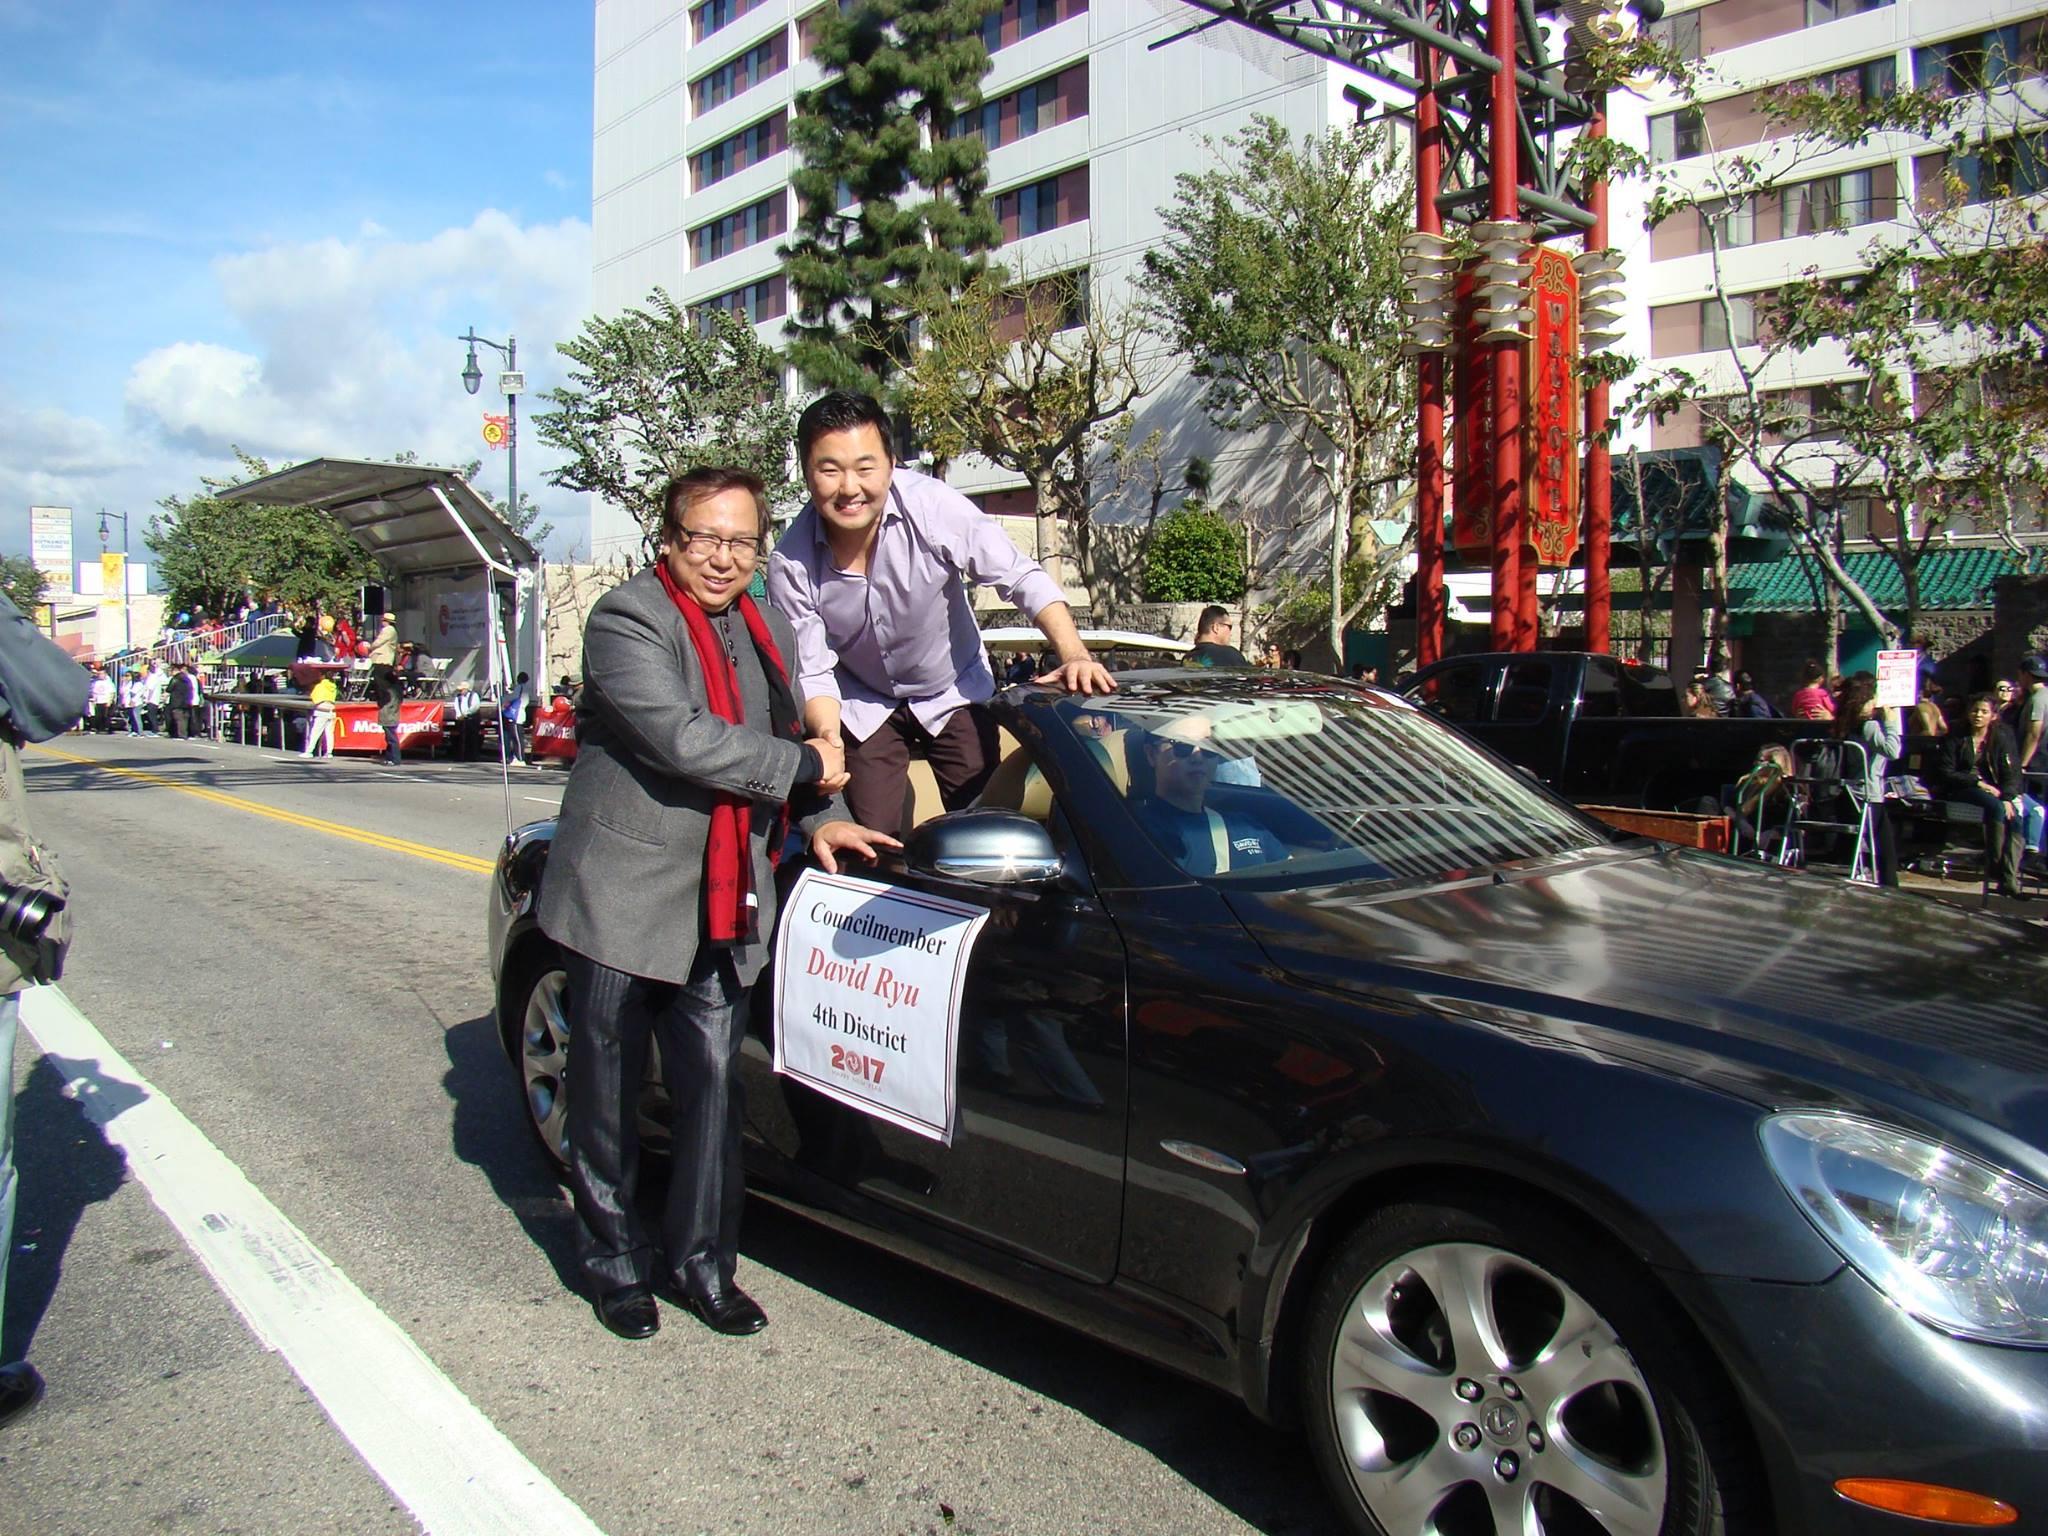 Hon. David Ryu, L.A. City Councilmember, 4th District.jpg